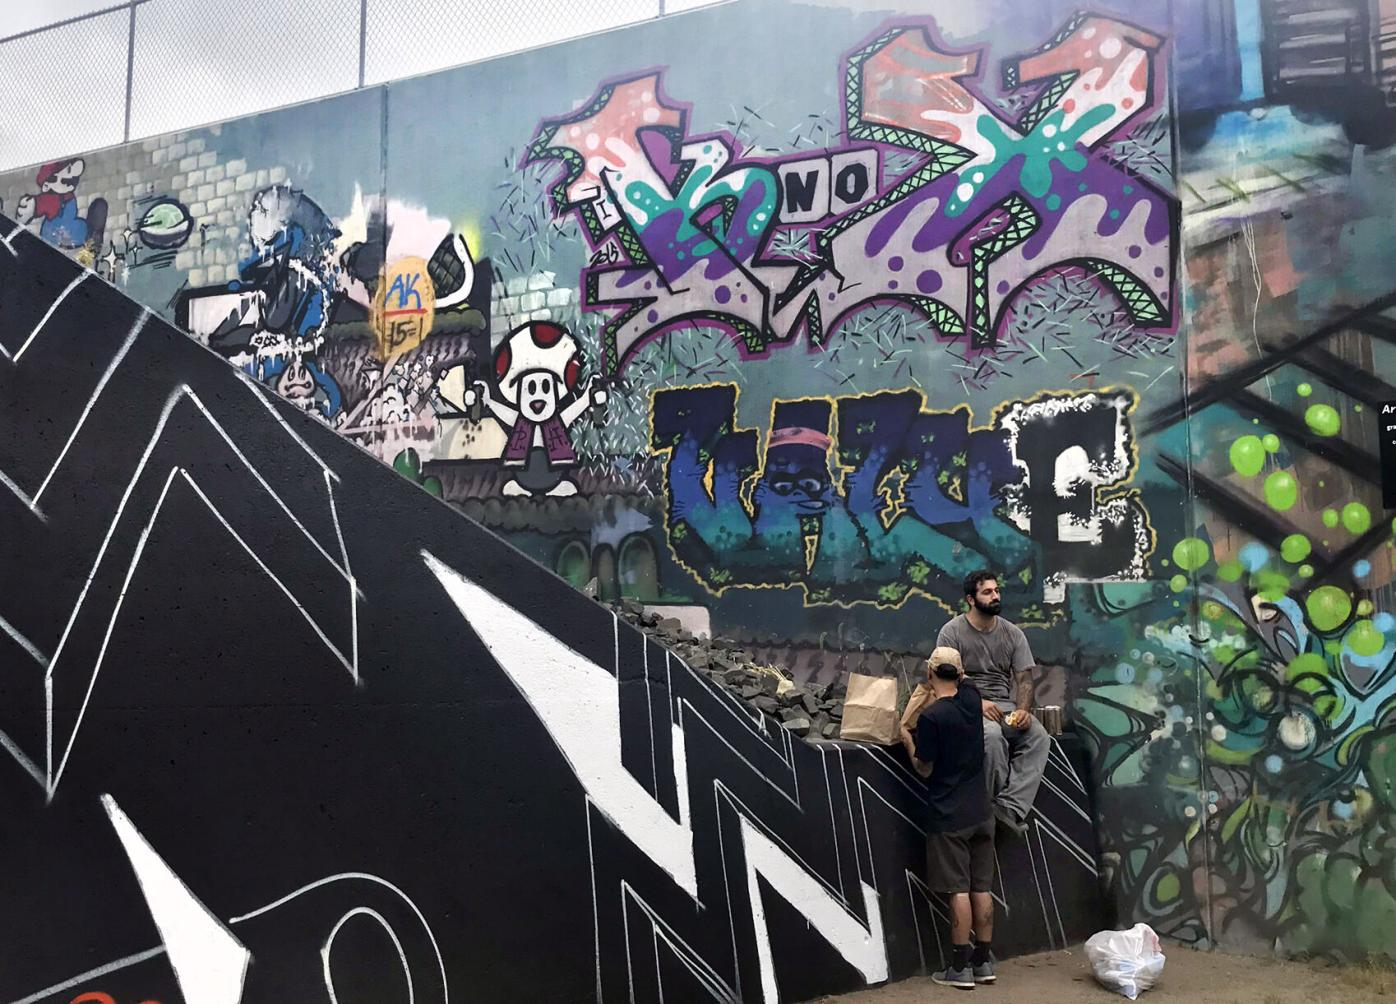 Vernon Rails-To-Trails Graffiti Mural